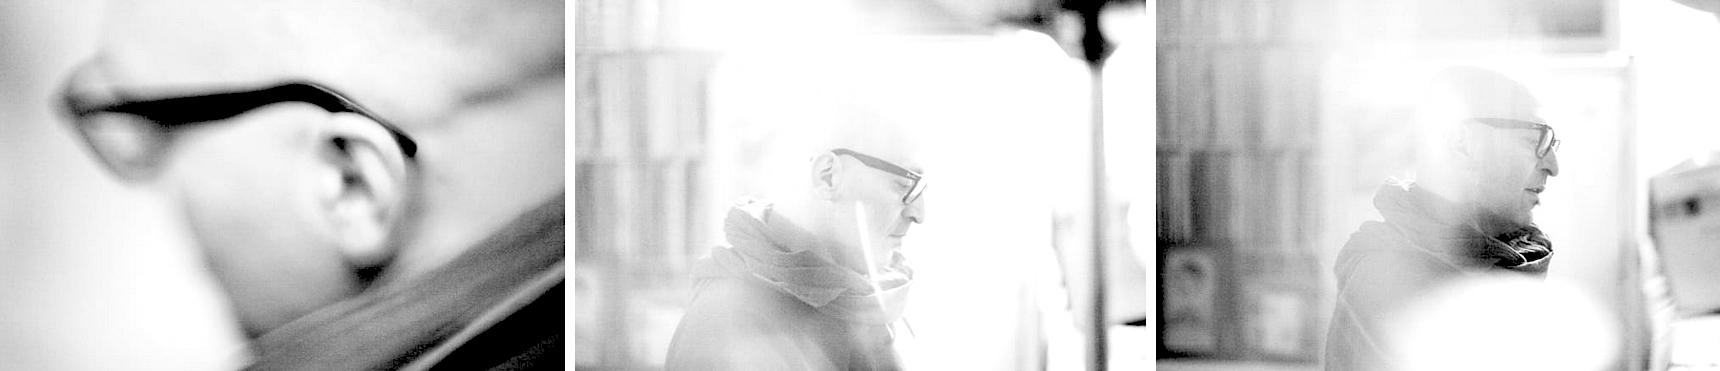 Gabriel Le Mar (@gabriellemar) Cover Image